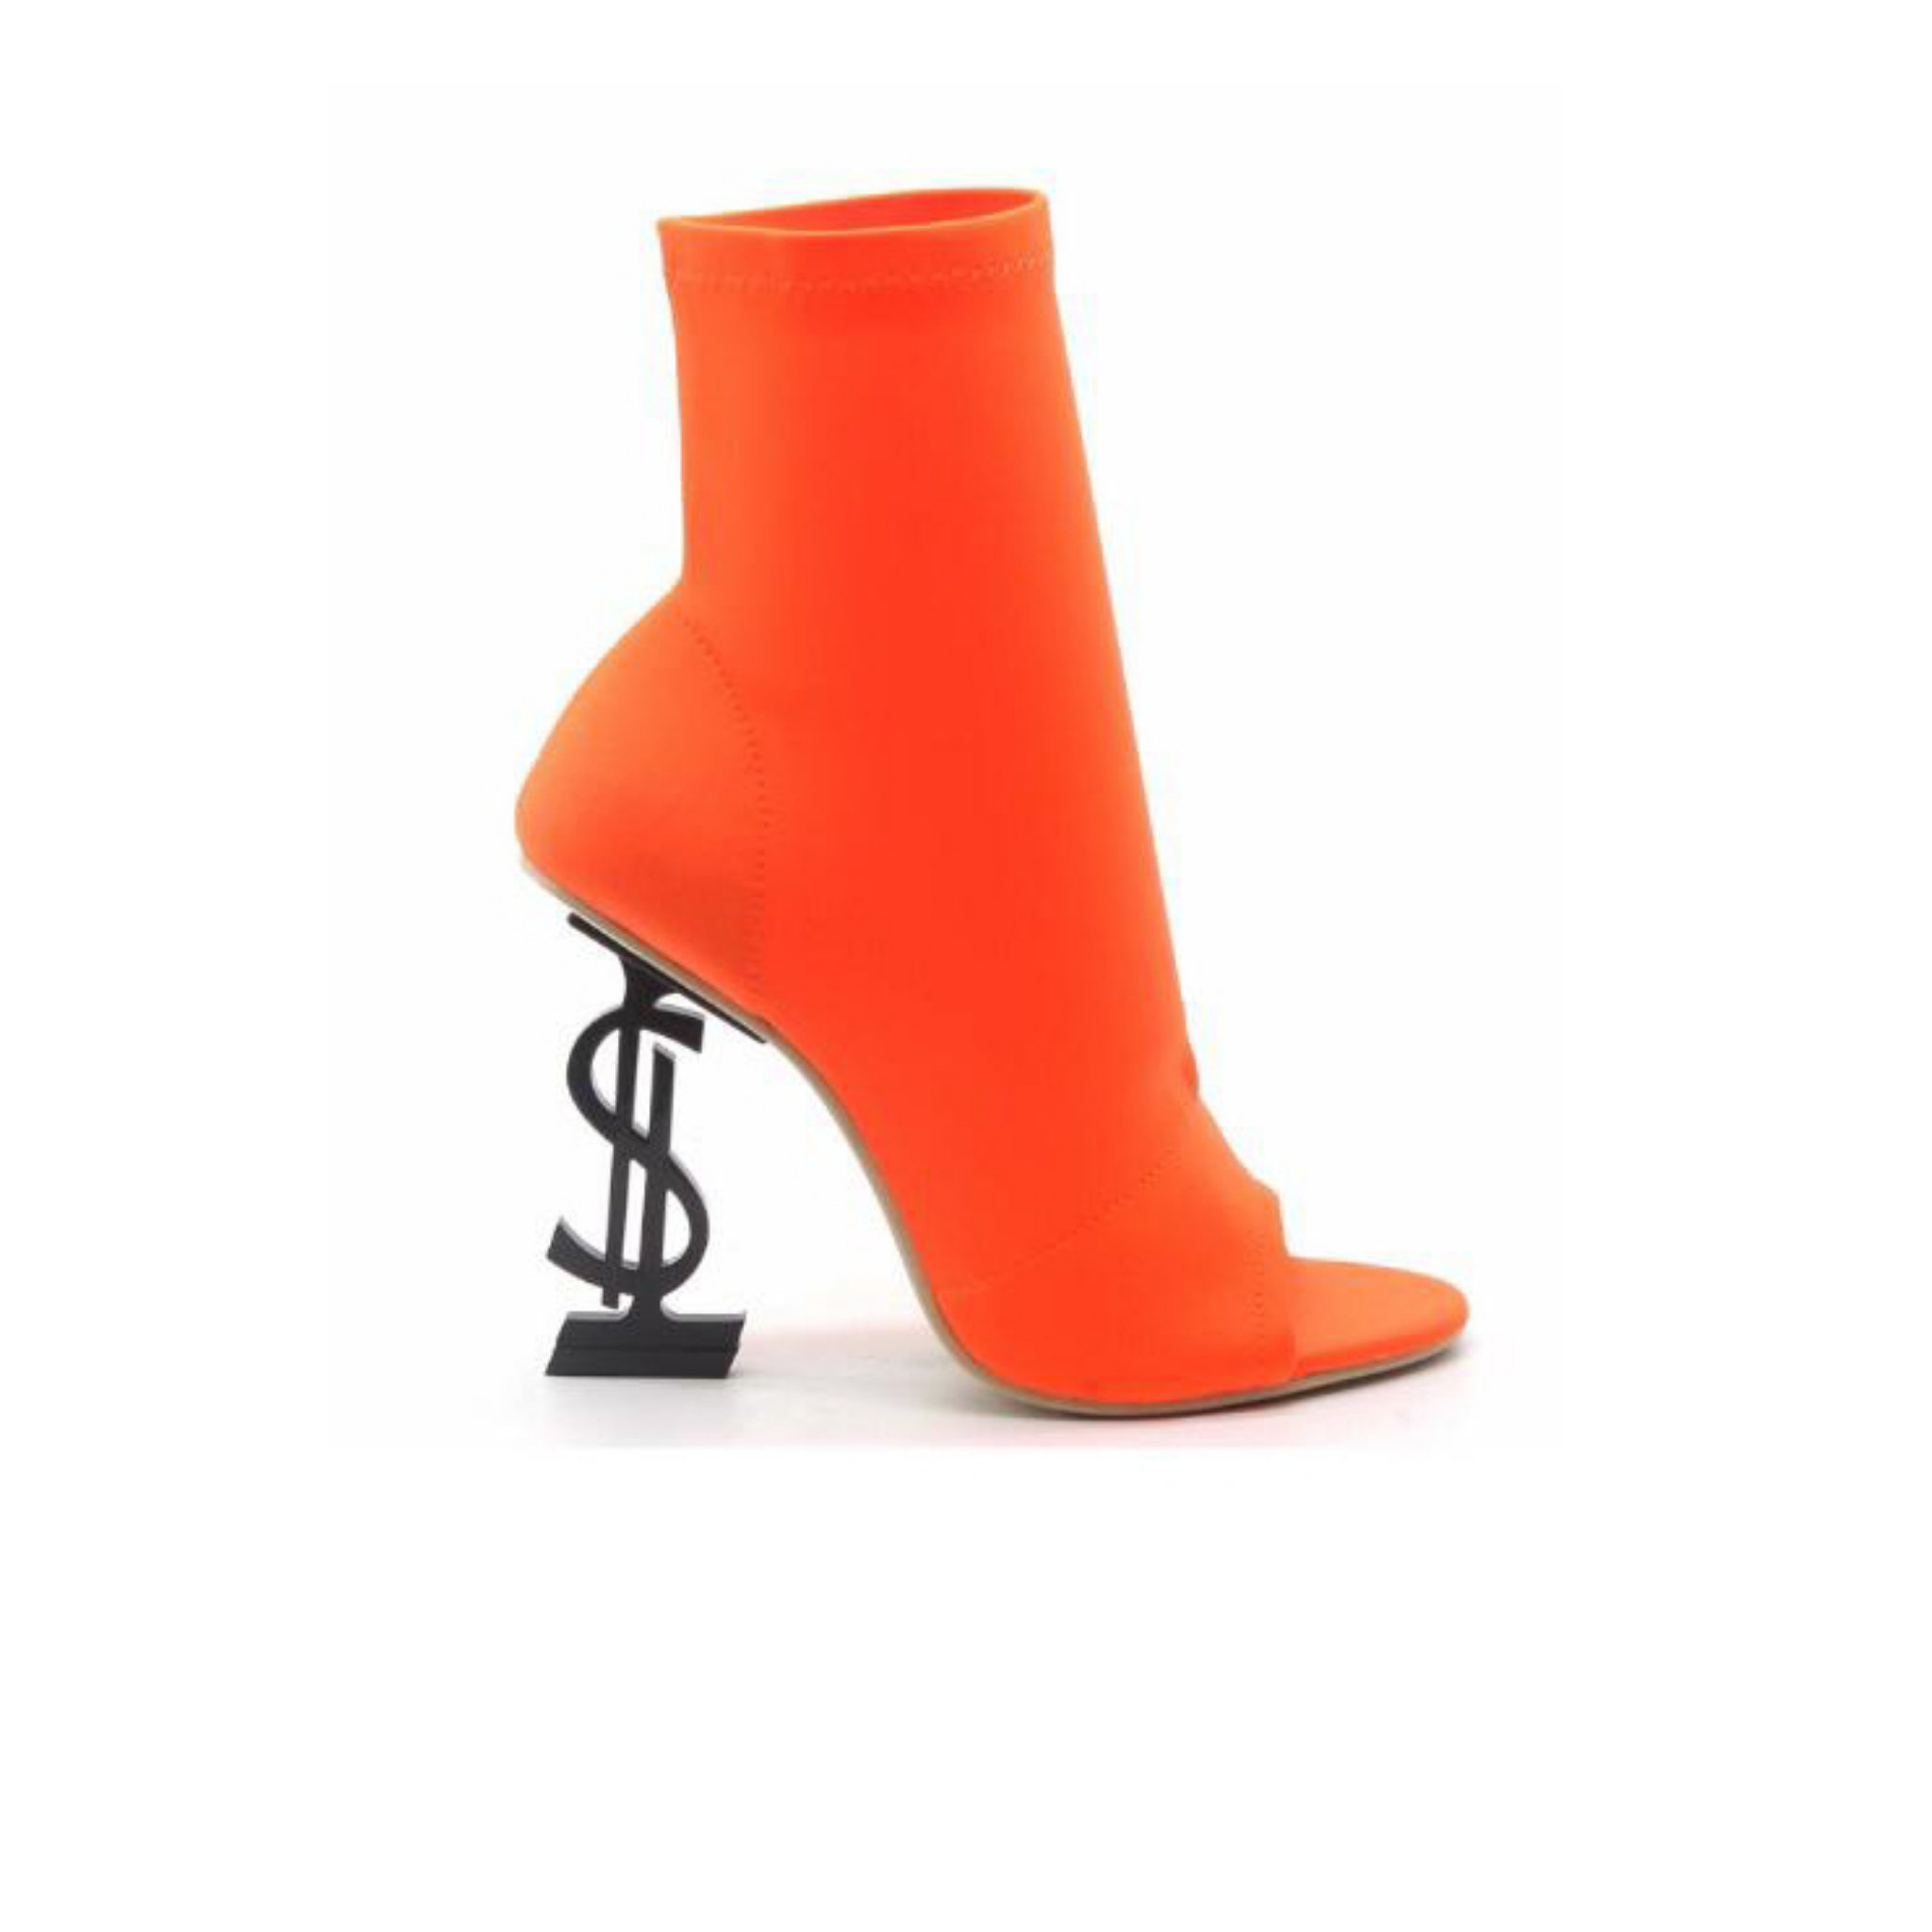 37db46b00 Money Booties-Orange | Shoe Addicts